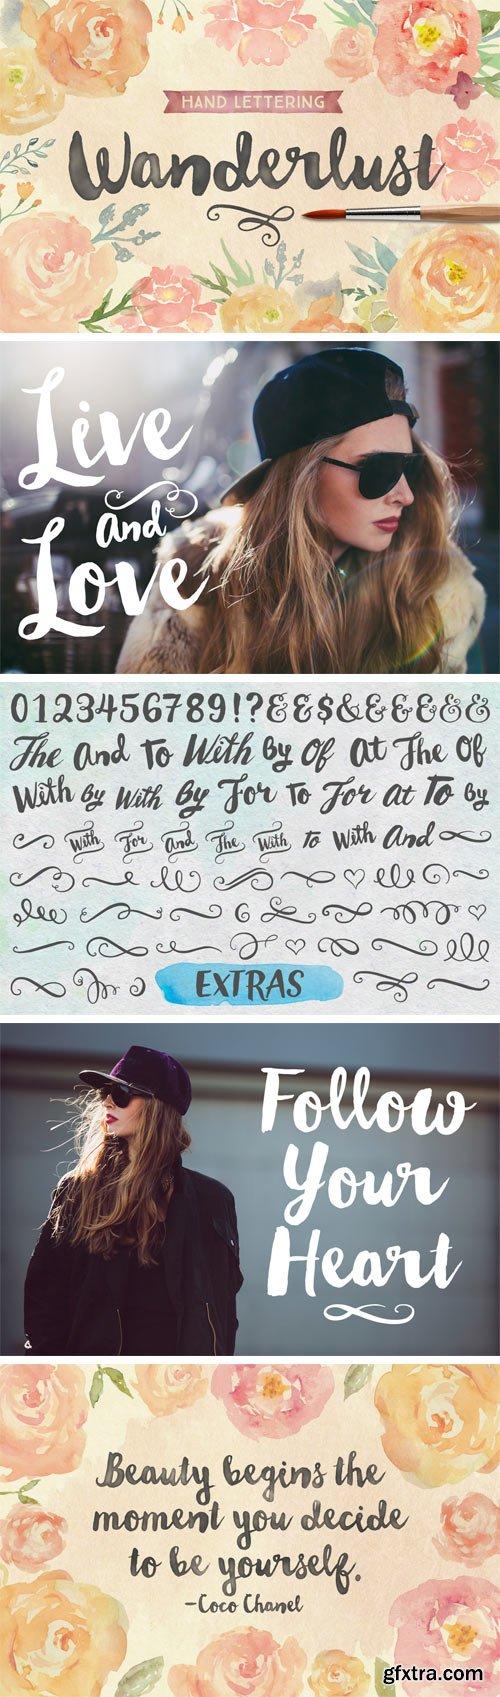 Wanderlust Letters + BONUS